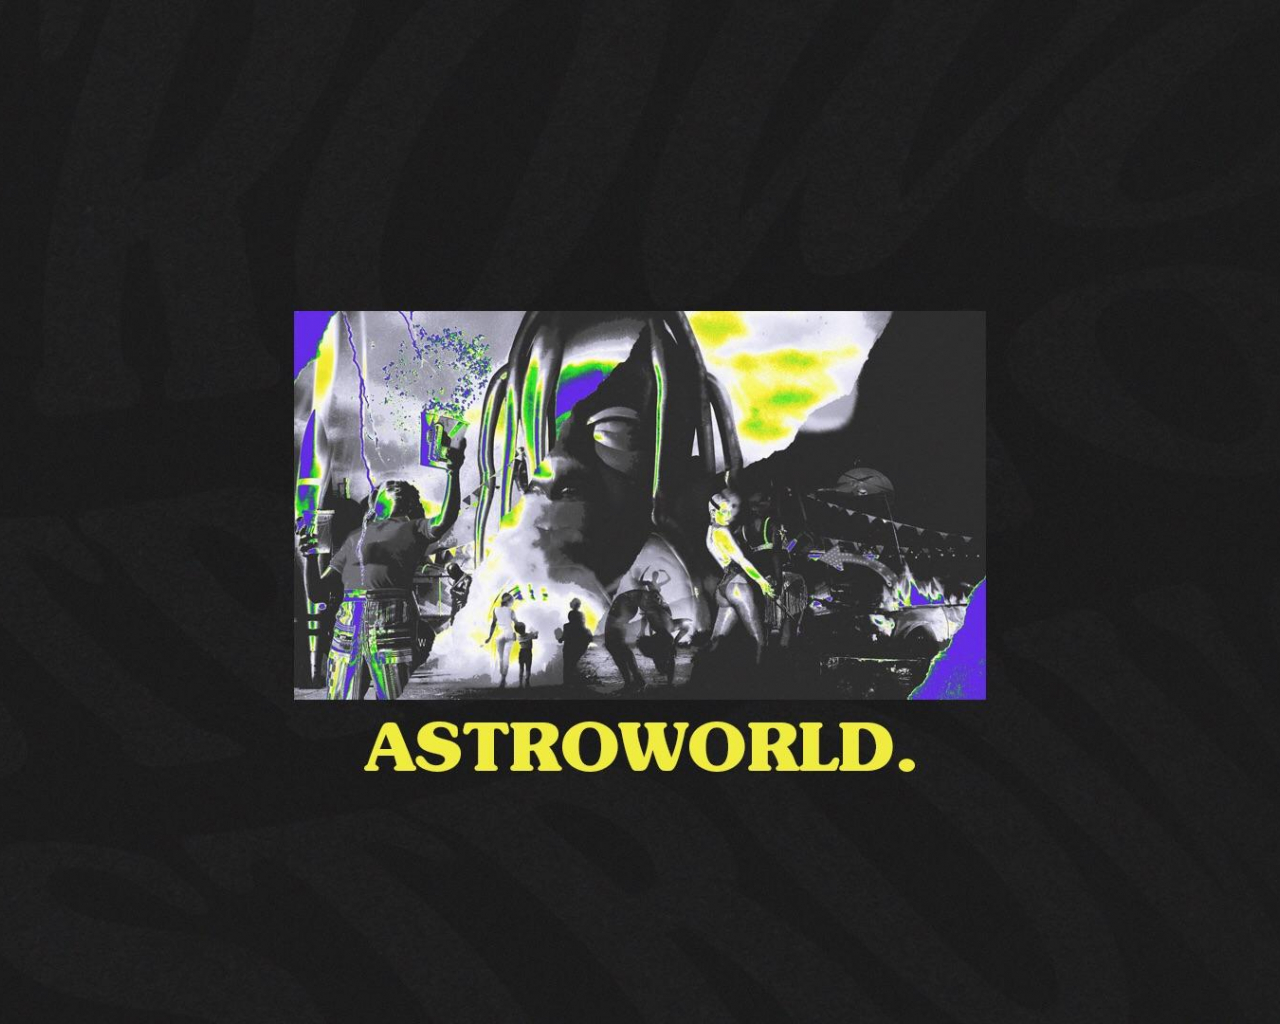 Free Download Astroworld Wallpaper Design 1080p Travisscott